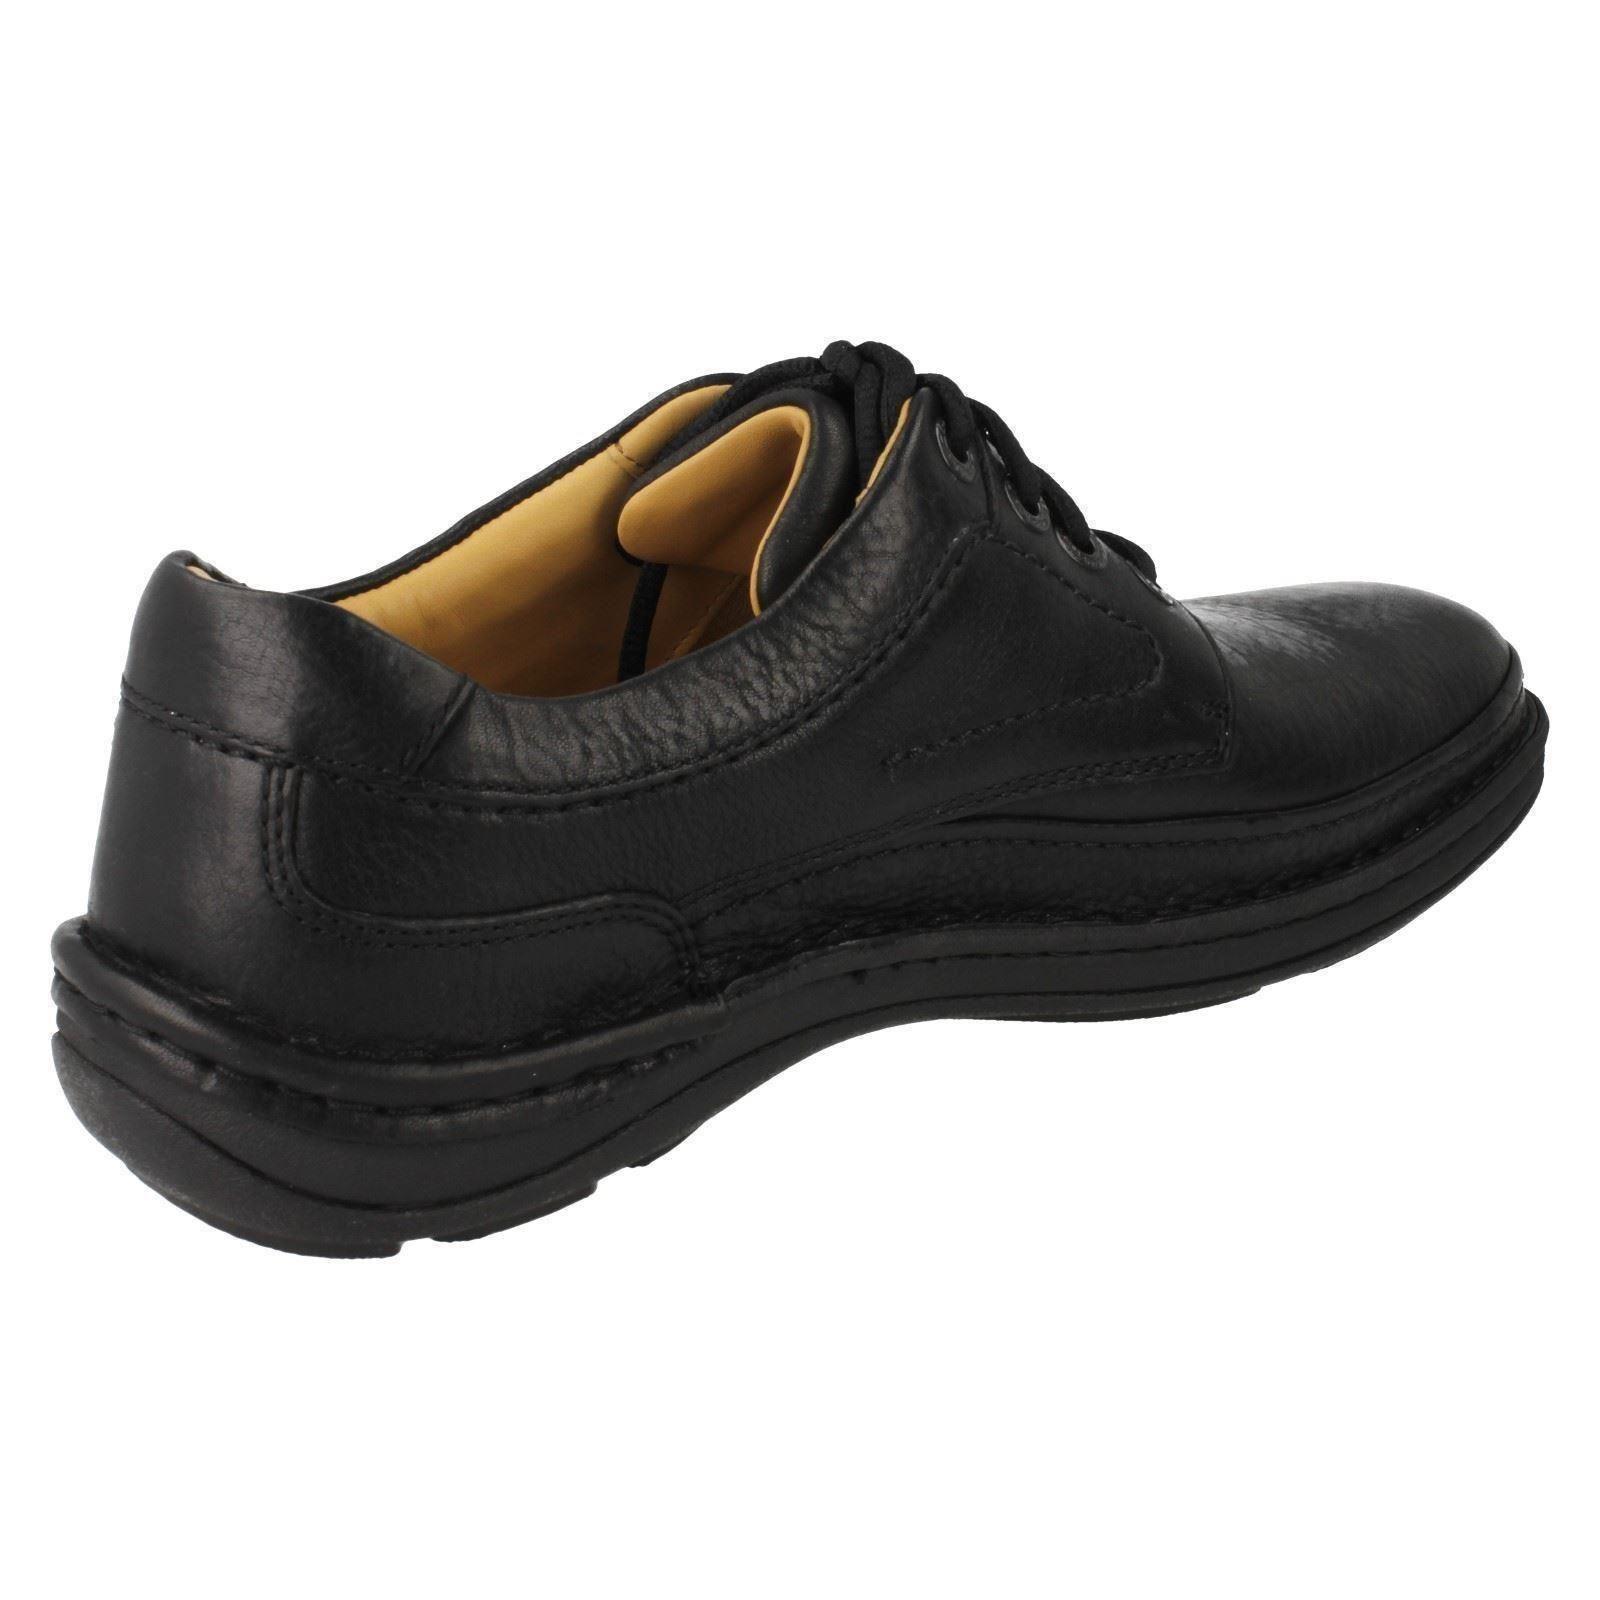 Men's Clarks Clarks Men's Shoes Style Nature Three 911e06